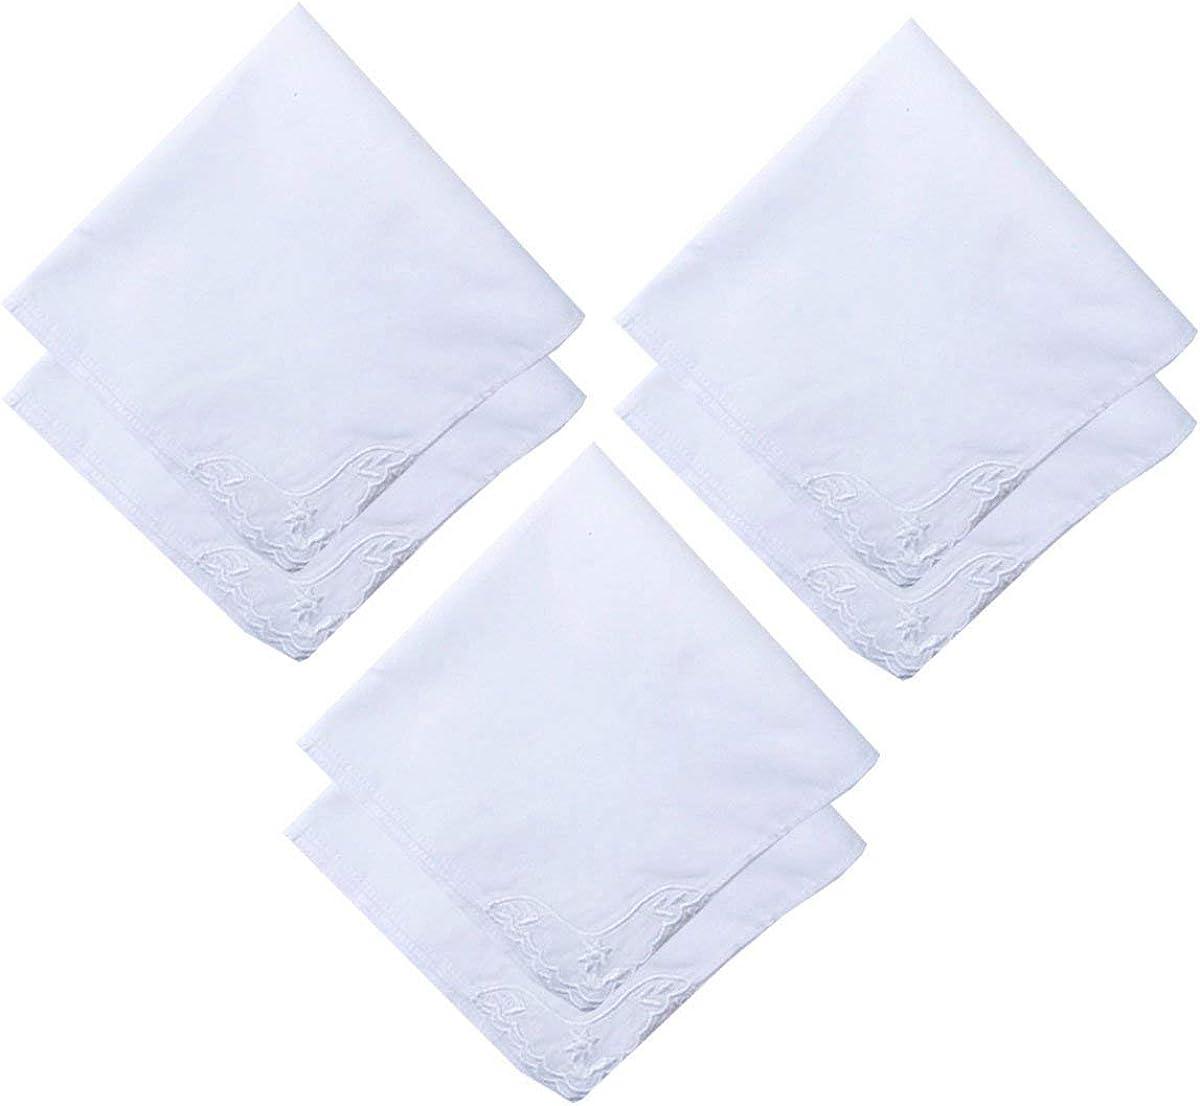 MileyMarla Ladies Embroidery Cotton White Handkerchiefs Lace Wedding Hankies